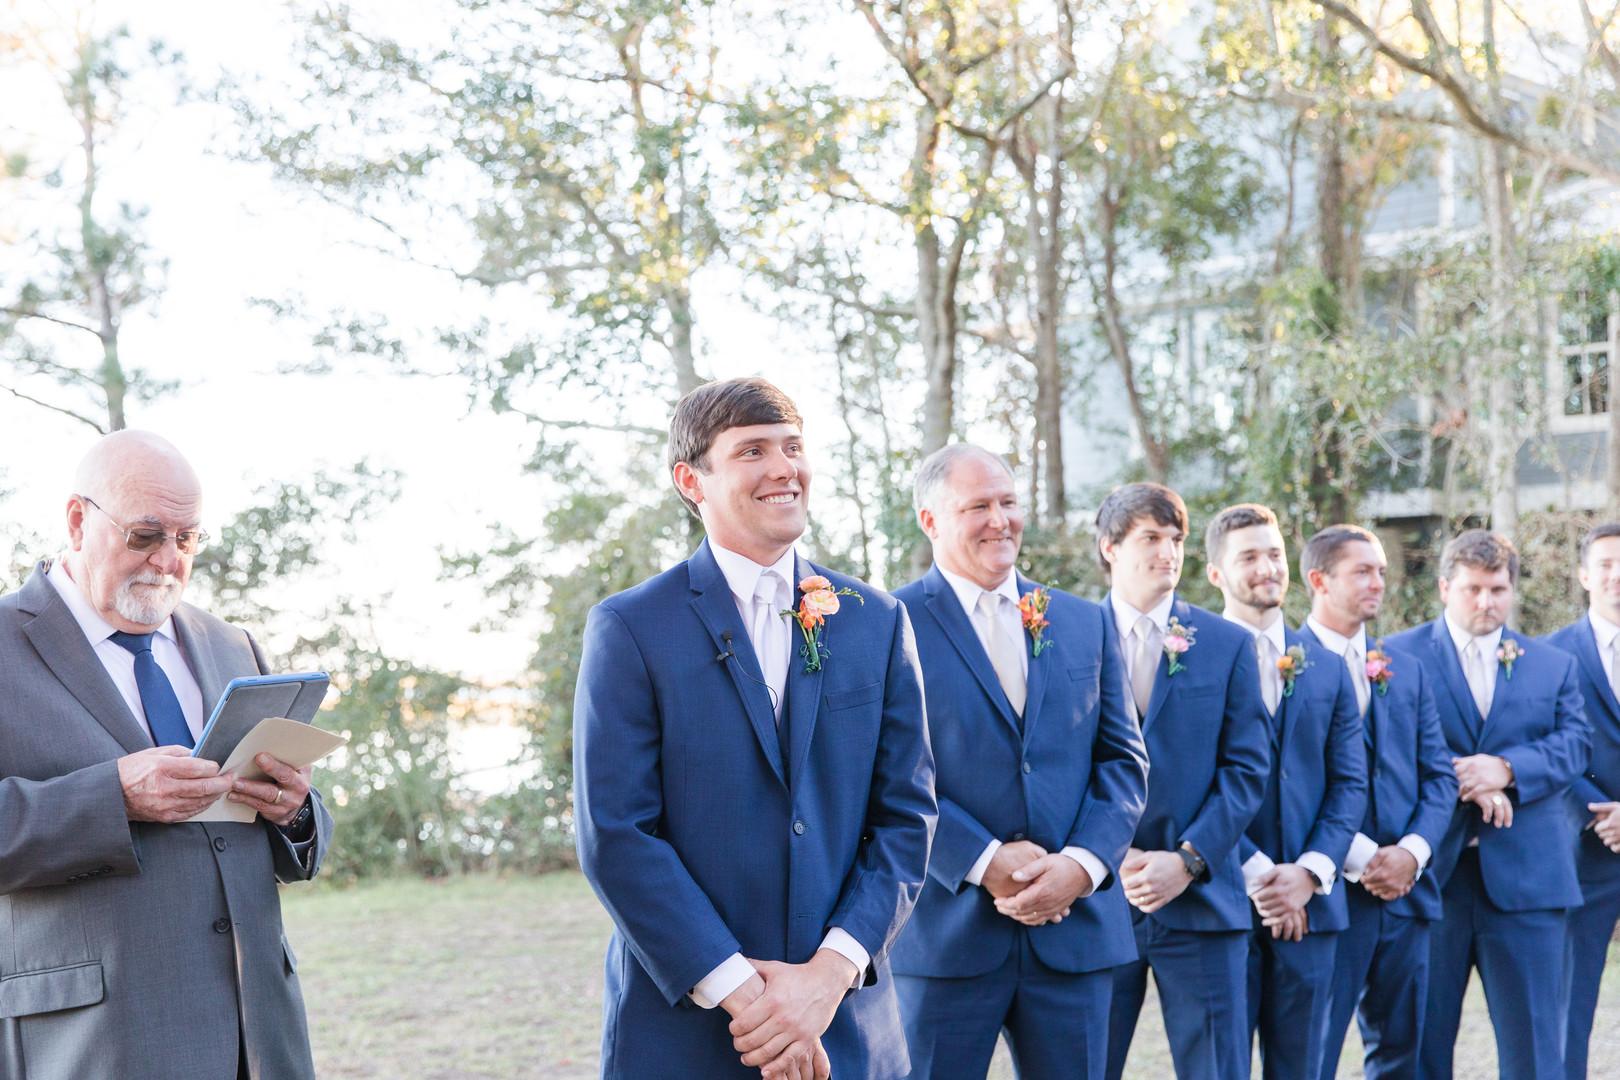 sunnyside-plantation-wedding-18.jpg